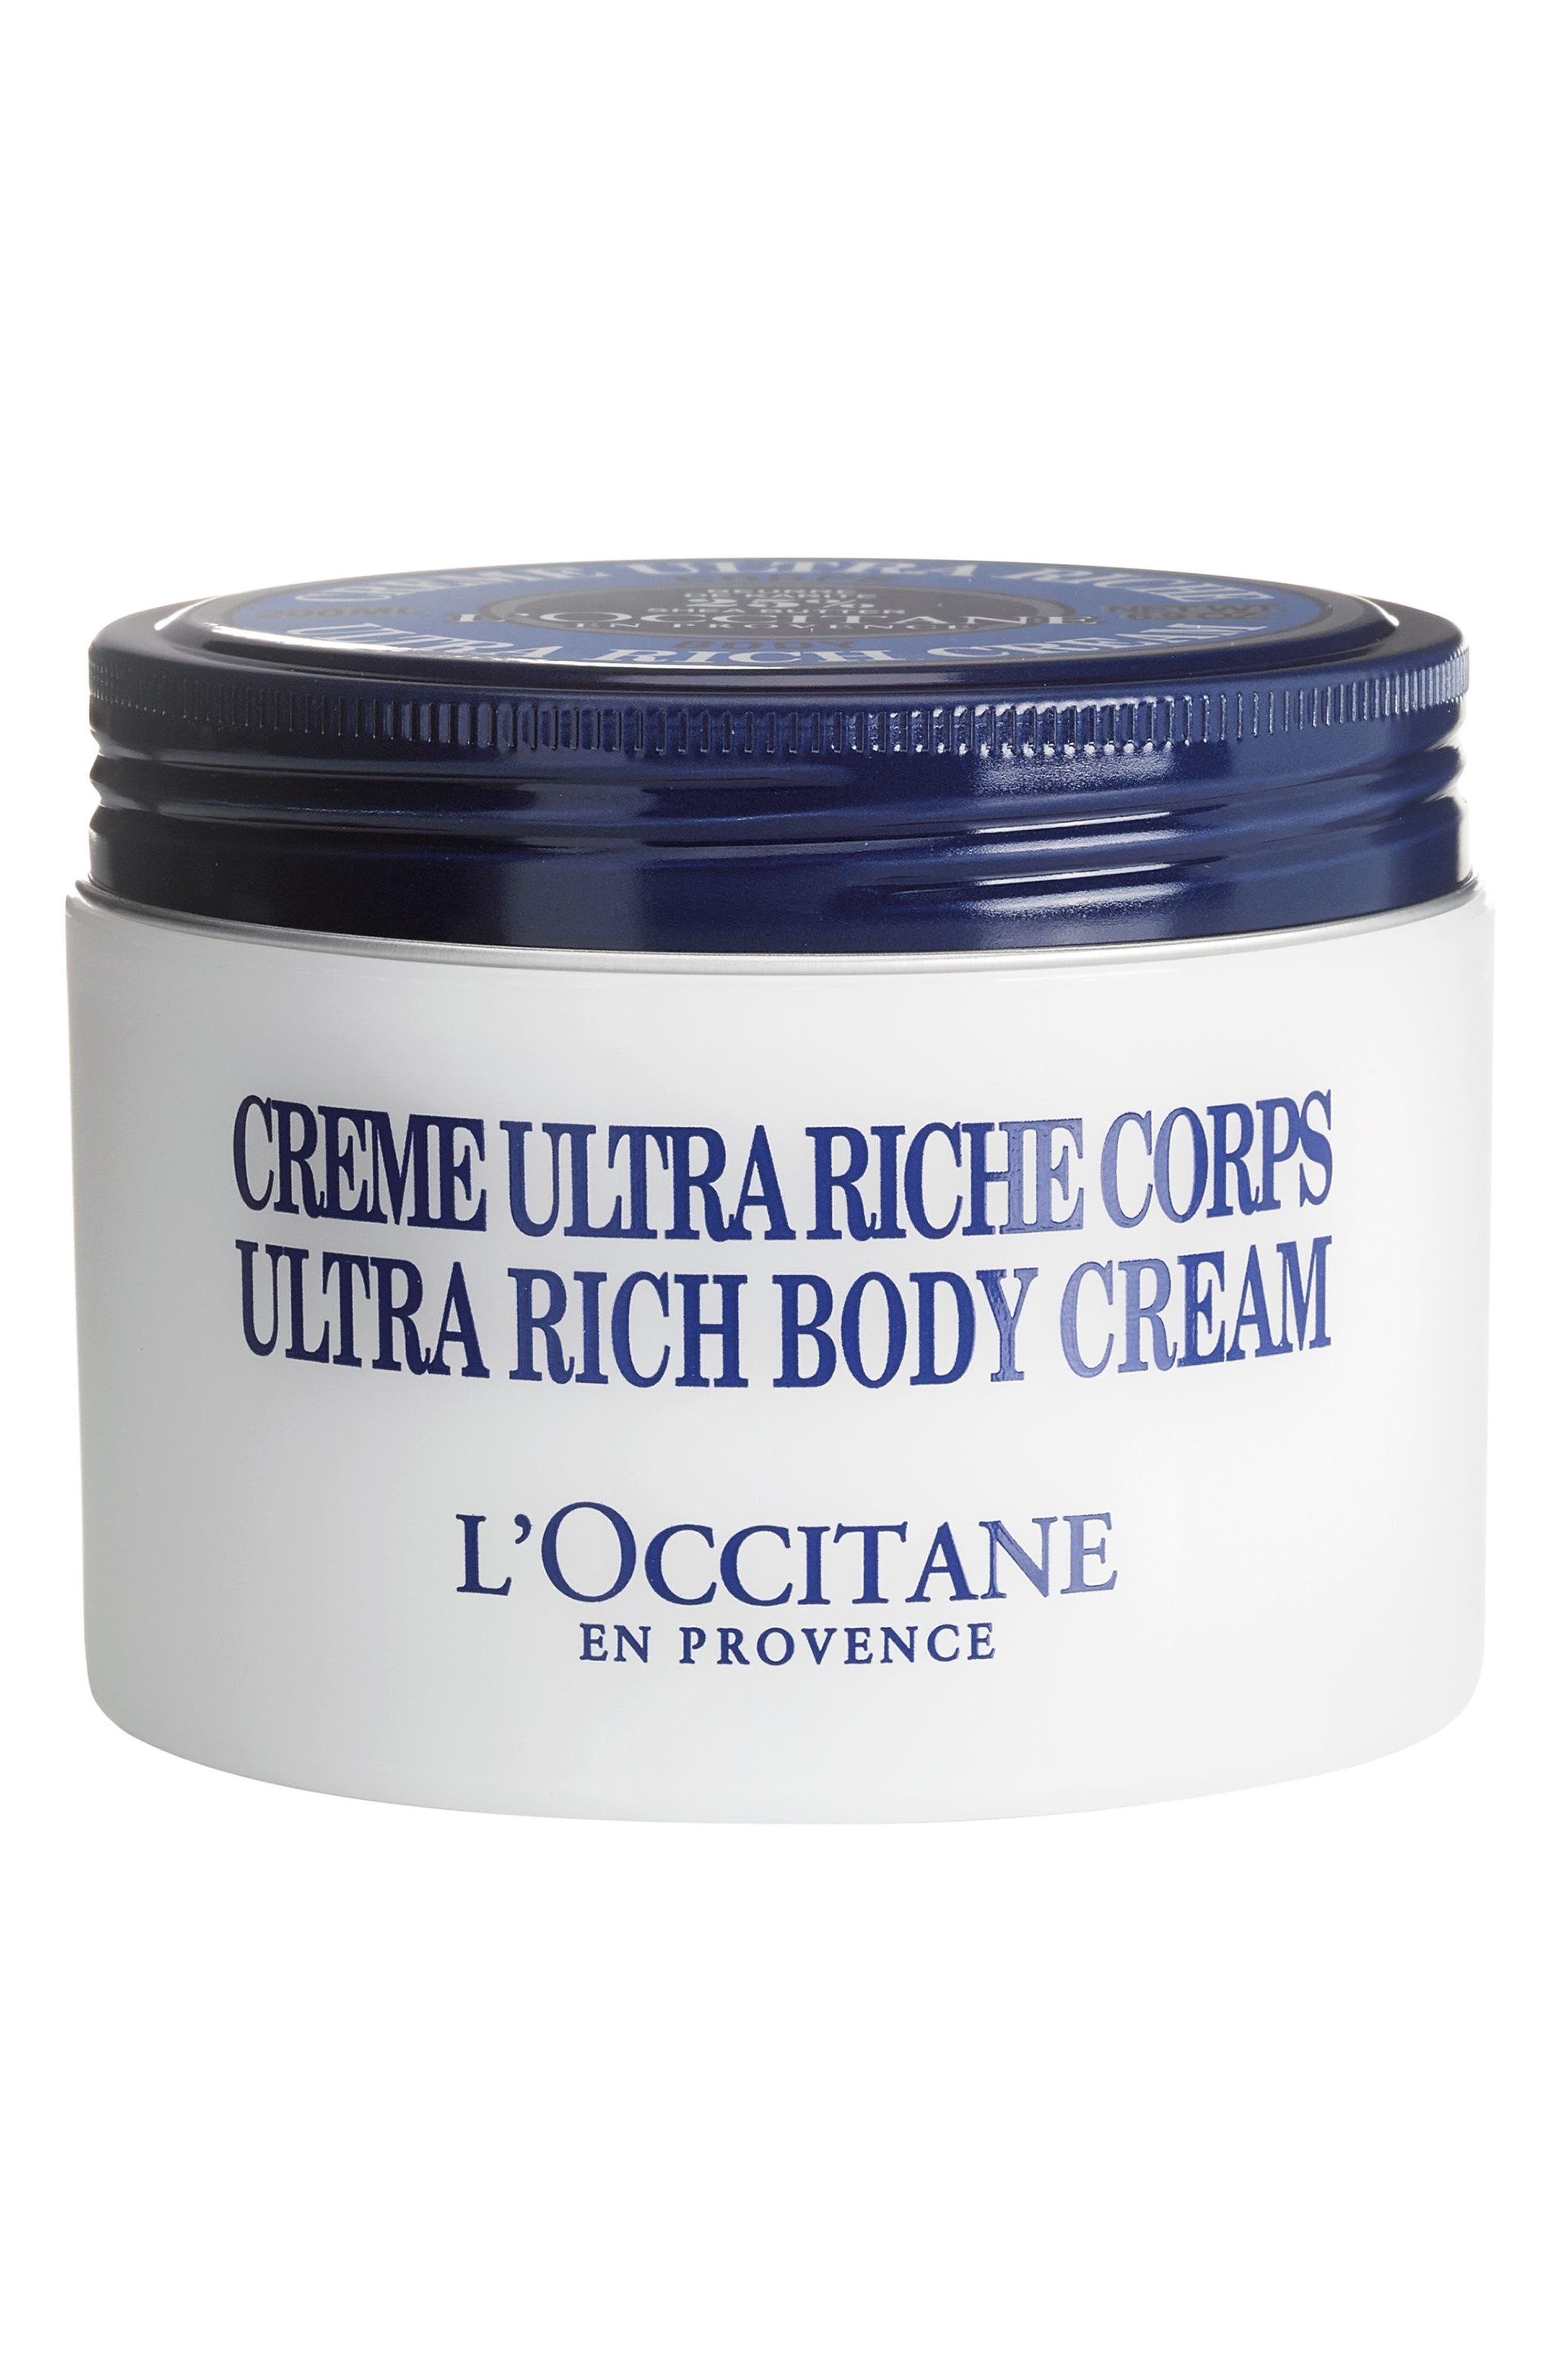 Shea Butter Ultra-Rich Body Cream,                             Main thumbnail 1, color,                             No Color